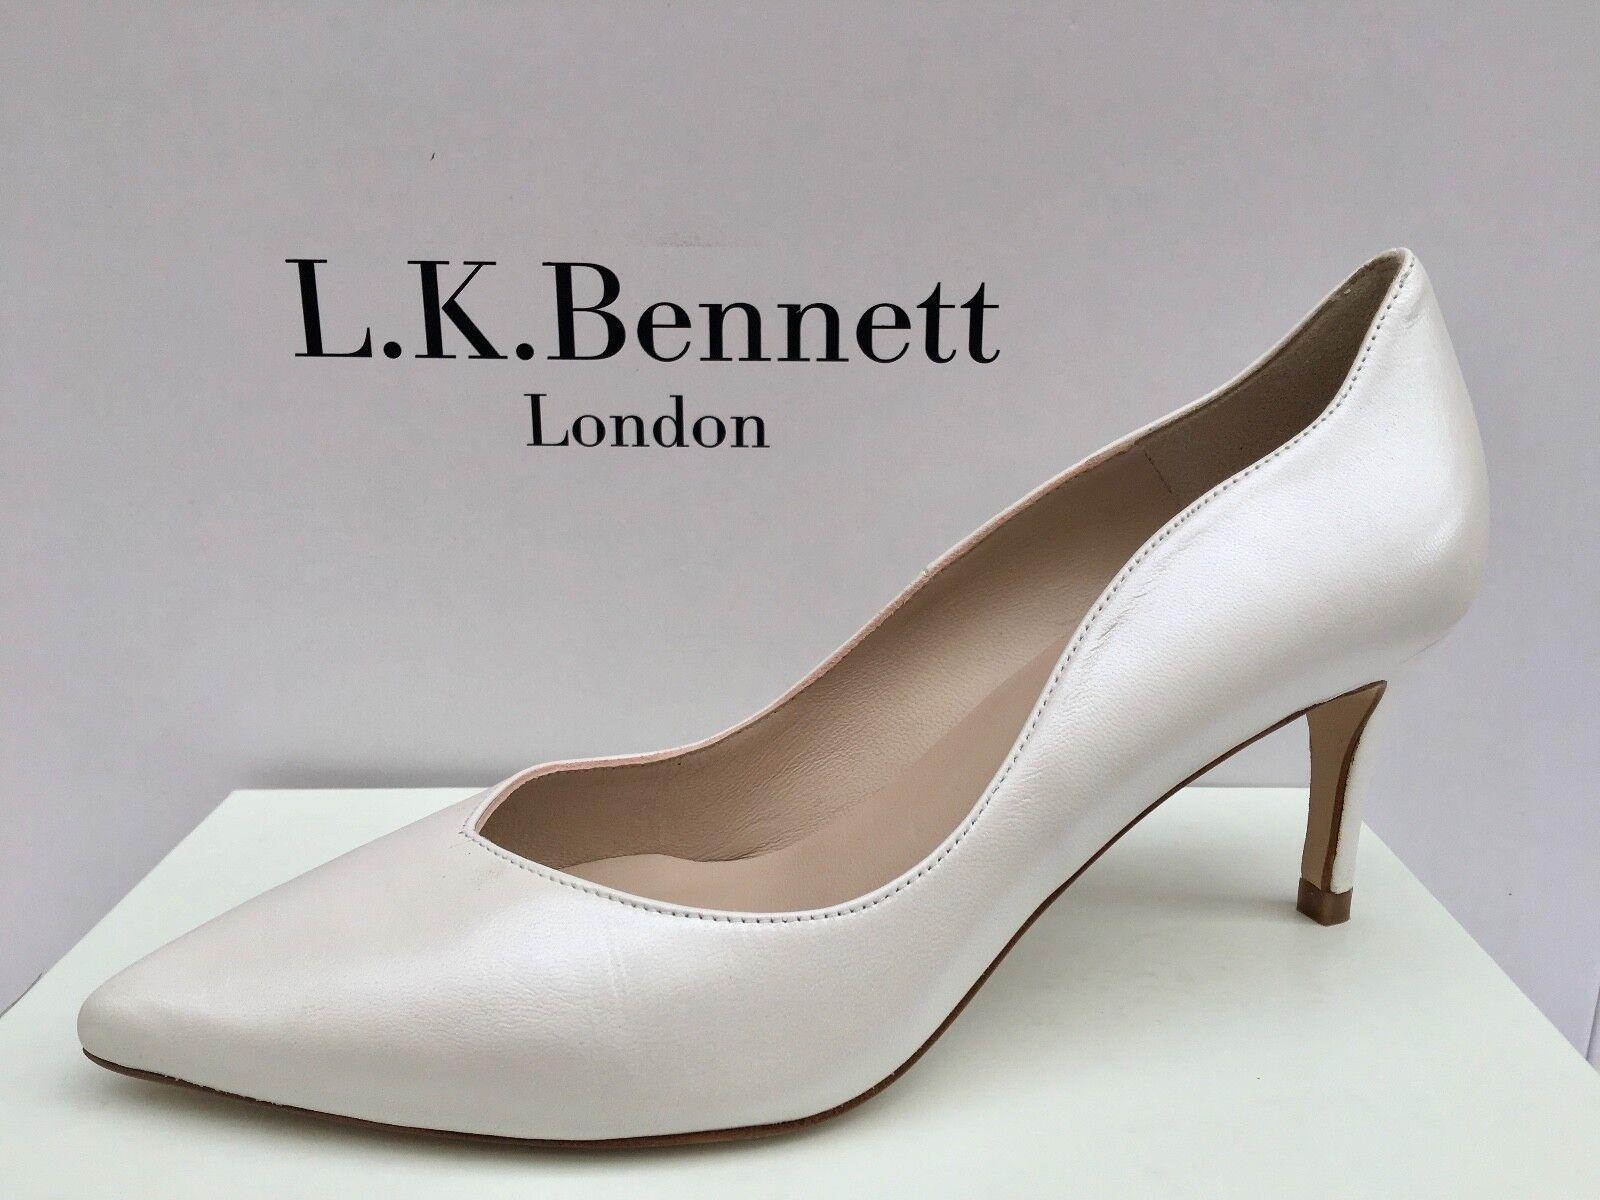 NEW Era  LK Bennett EU41  UK8 ODYSSEIA Perla avorio biancastro Corte Matrimonio